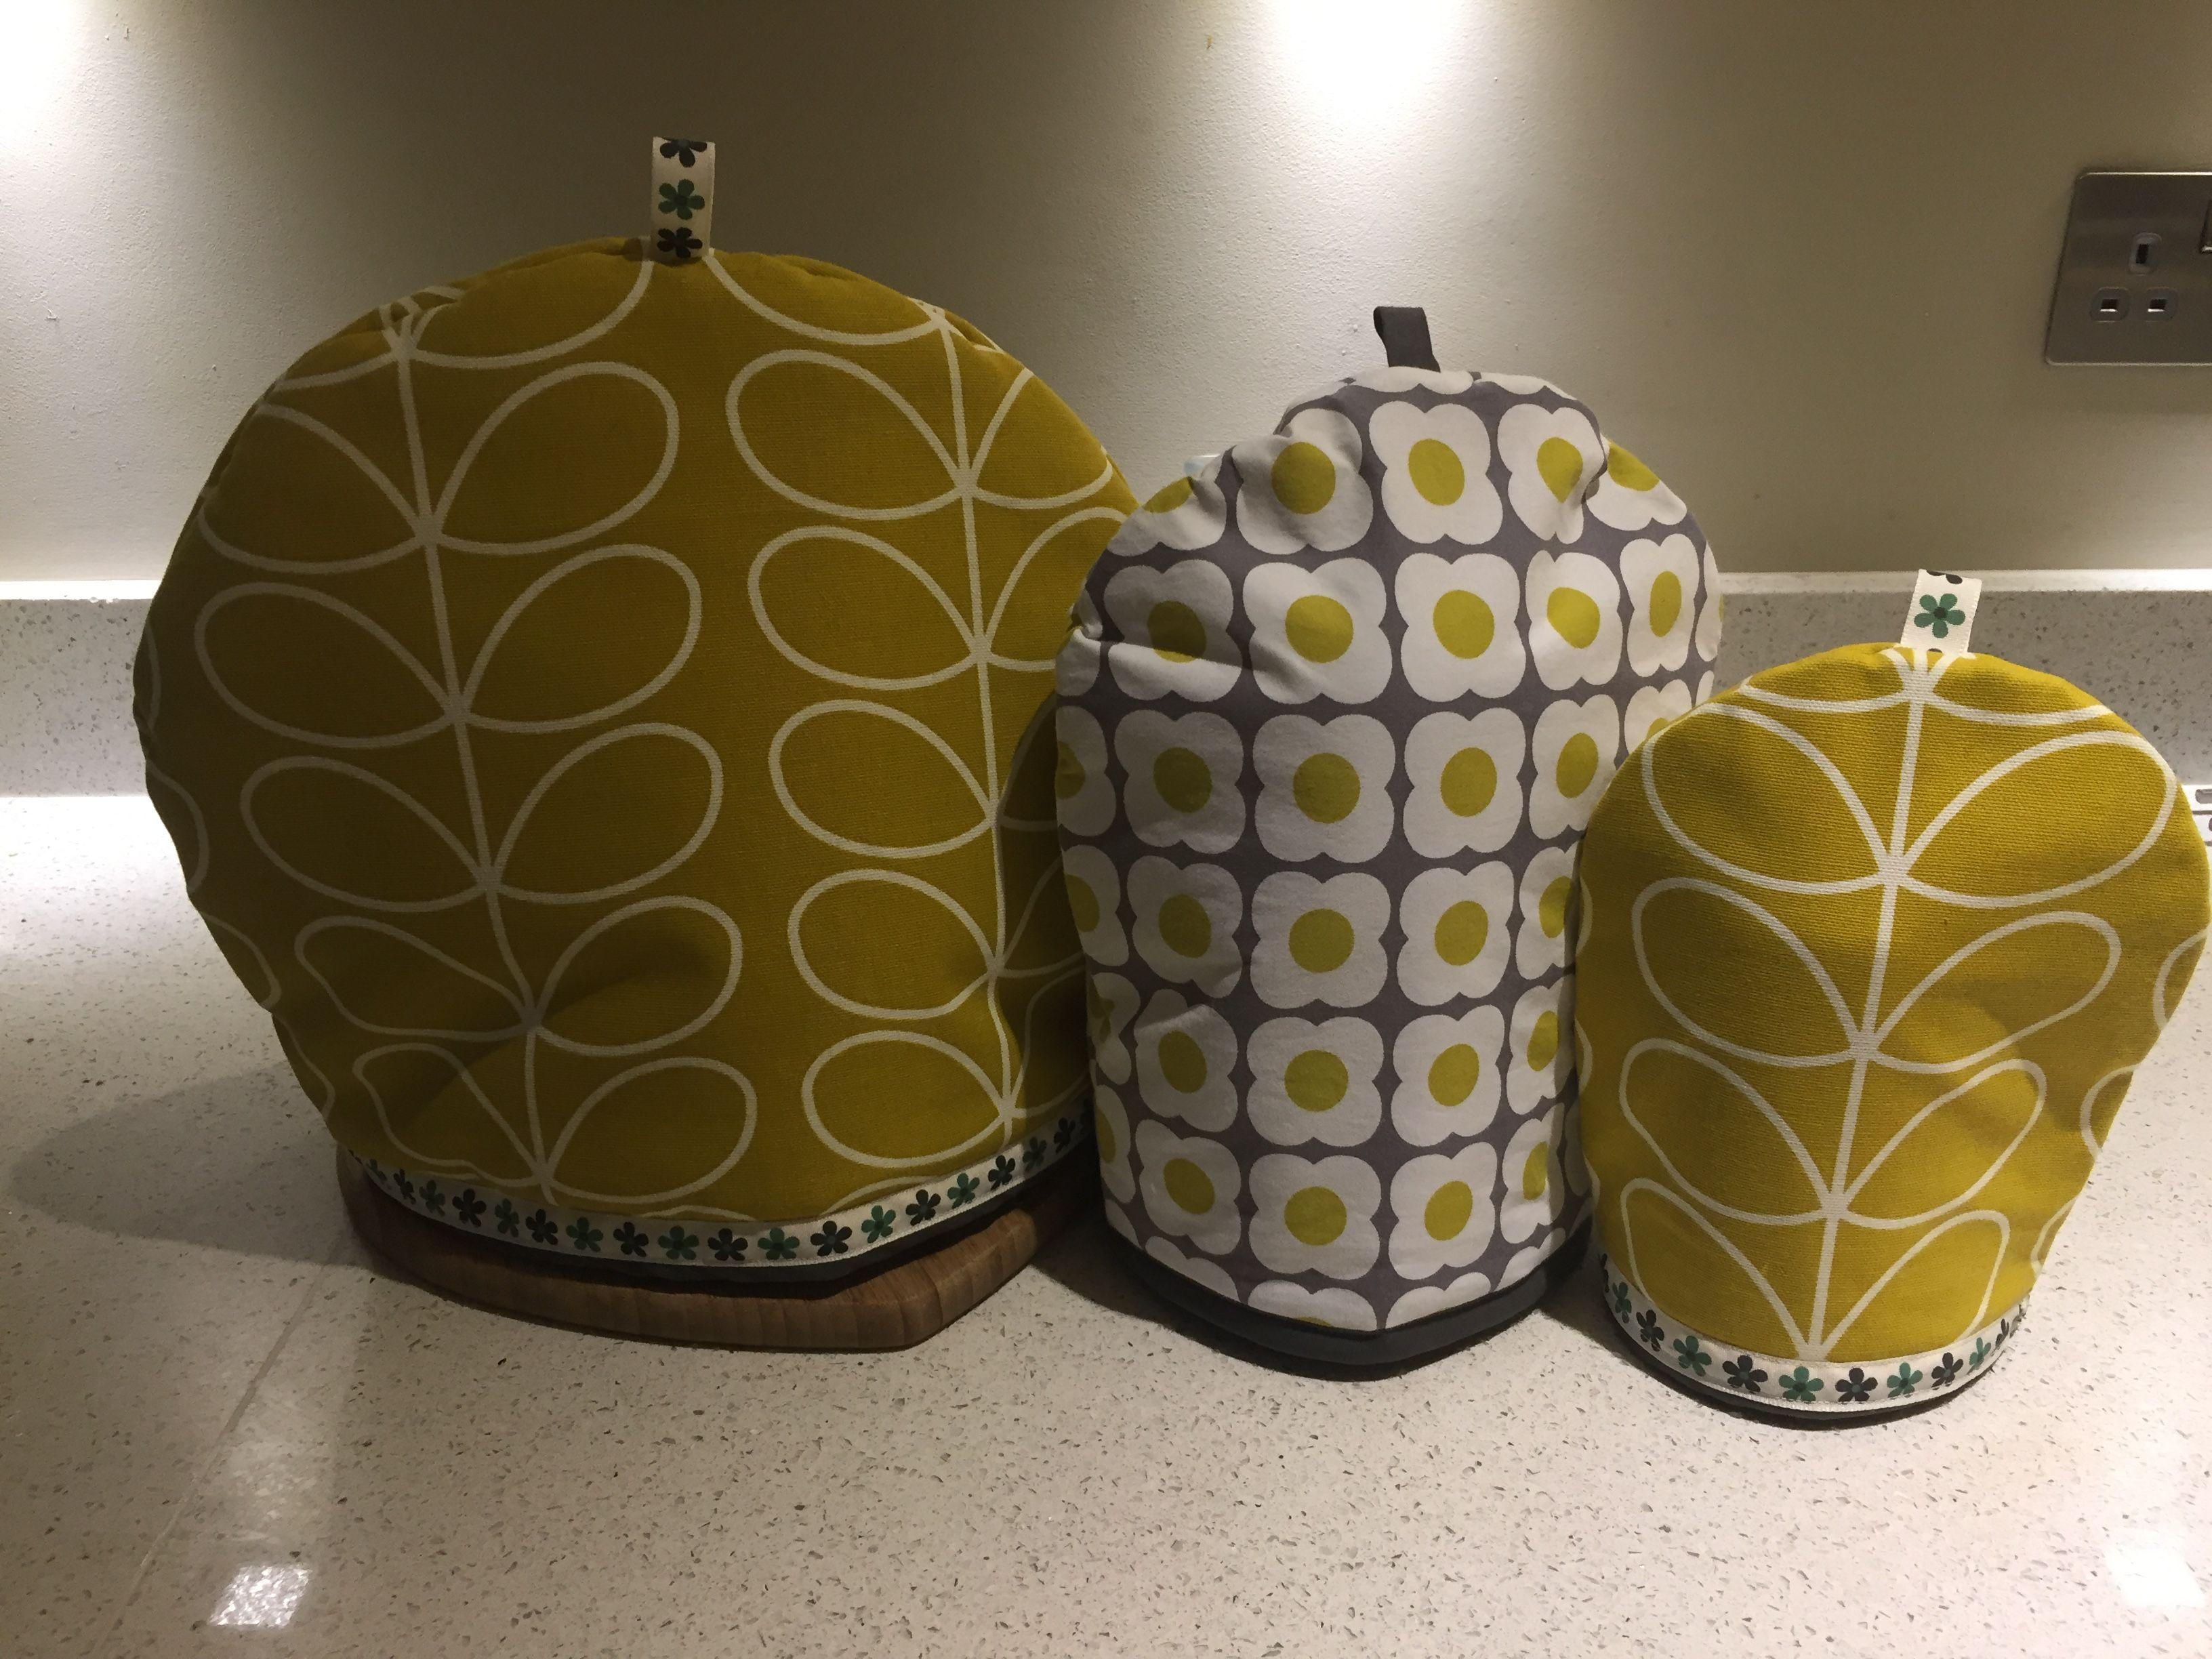 72ec4dfe4024 Orla kiely fabric tea cosy & cafetiere cosies | Home crafts | Orla ...